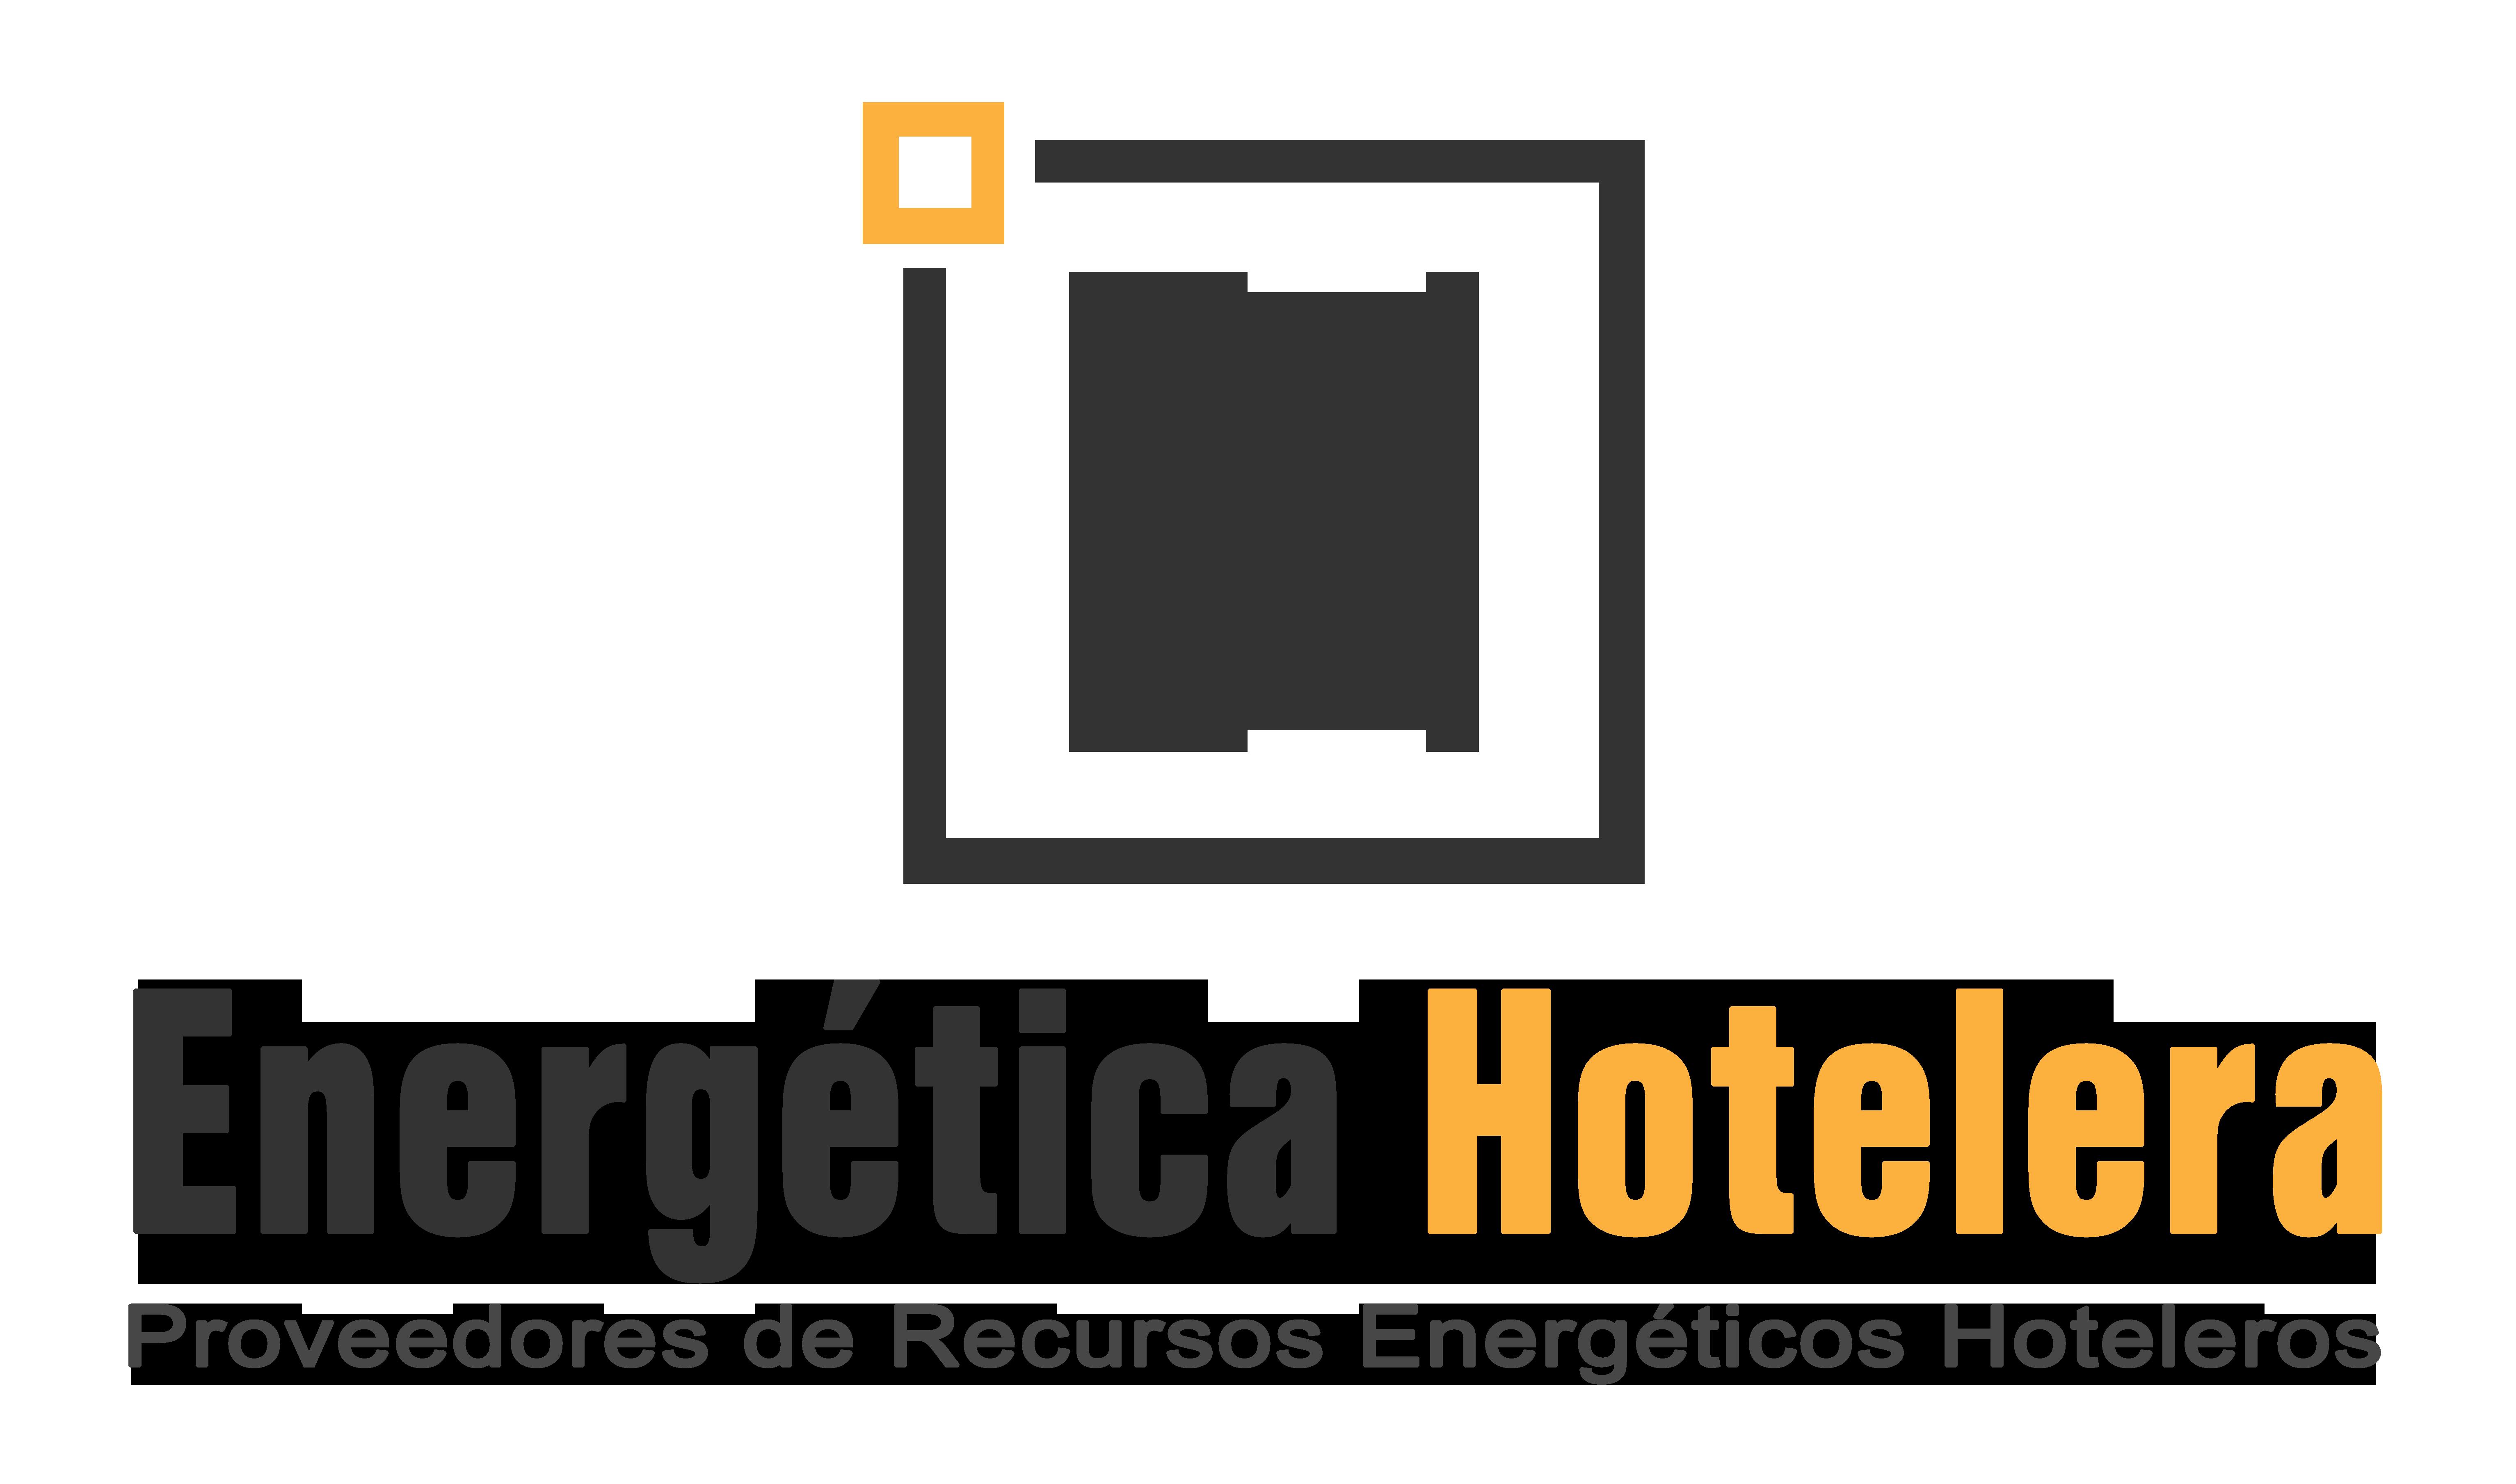 Energética Hotelera